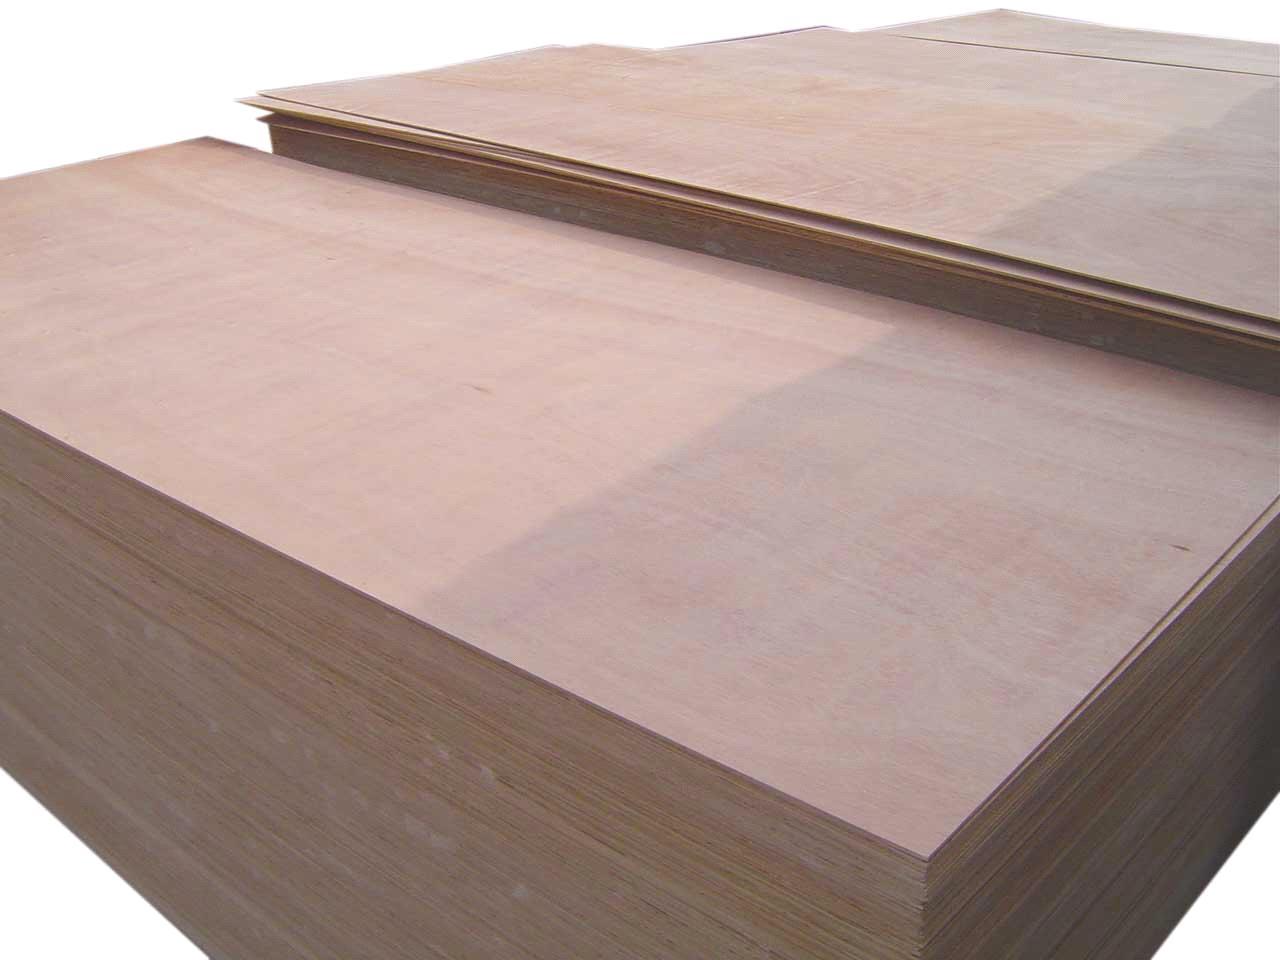 Marine plywood purchasing souring agent ecvv